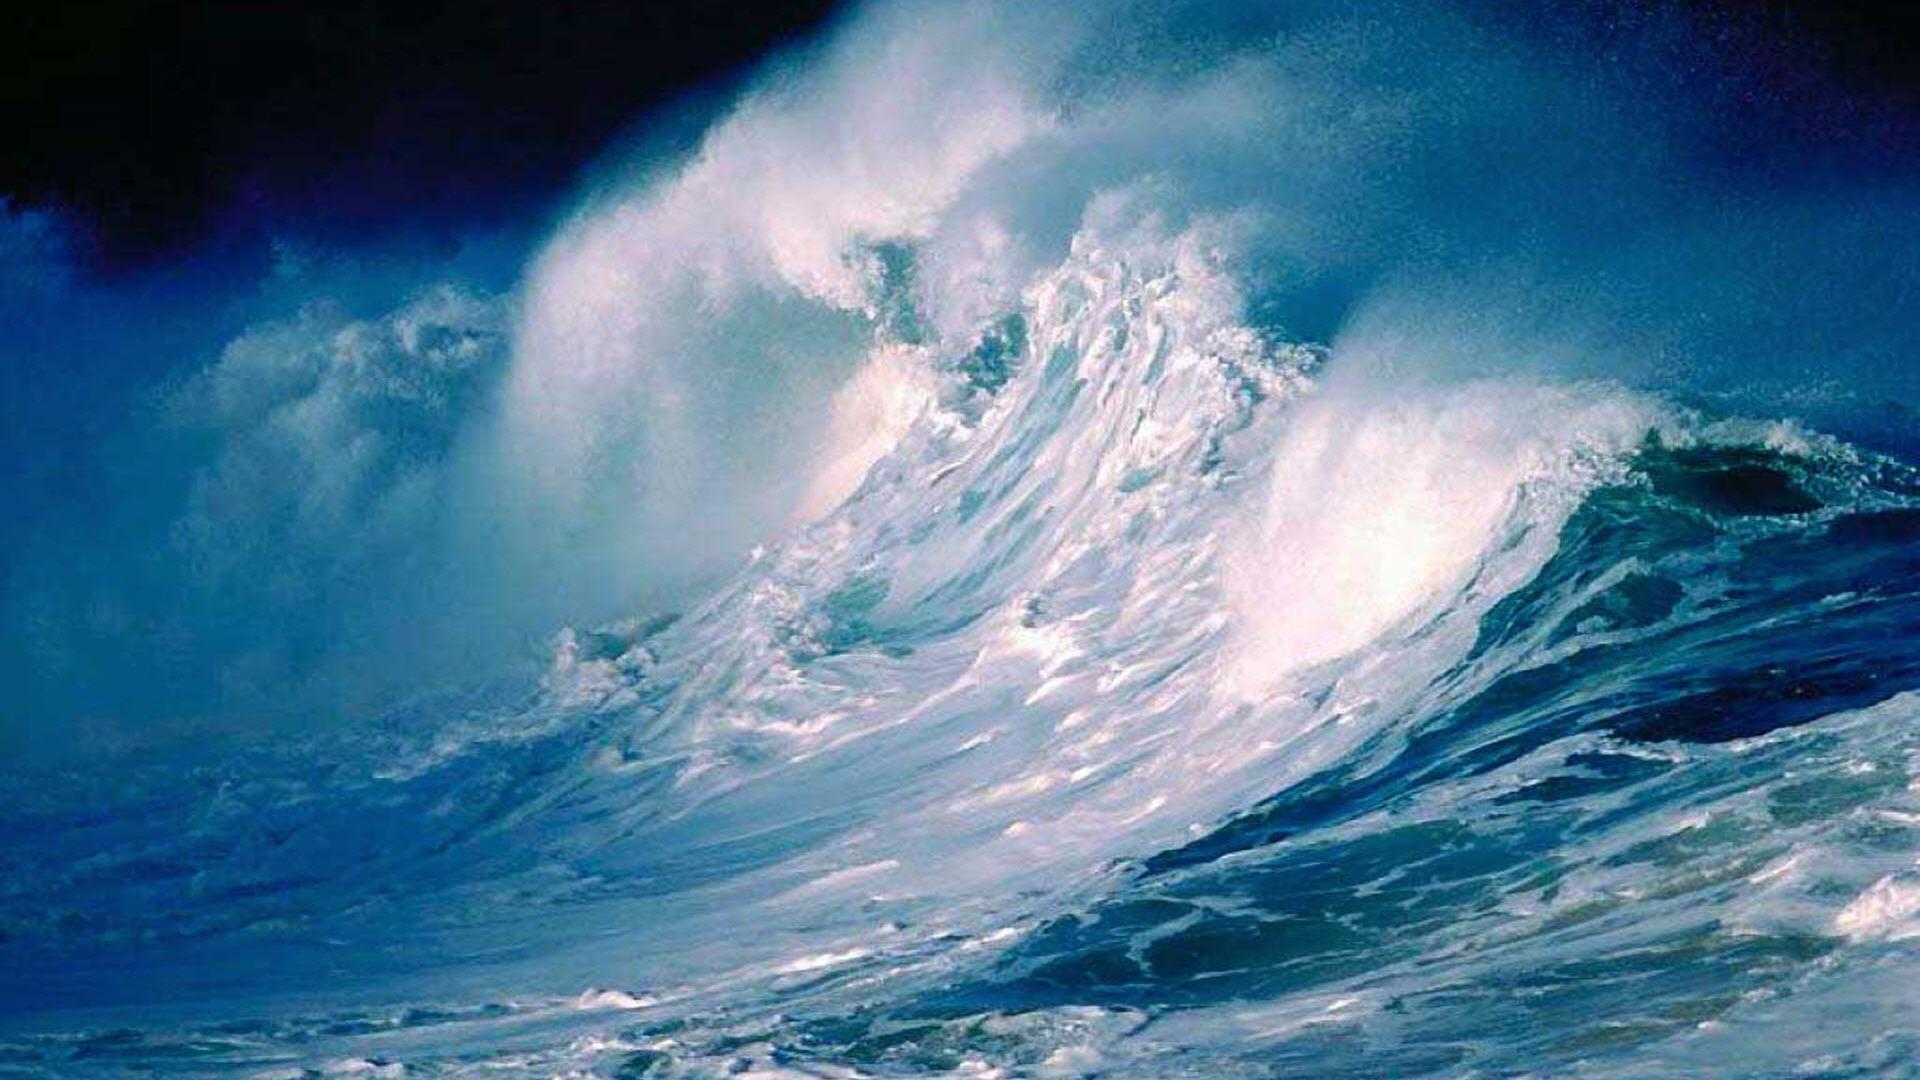 Ocean Scene Wallpaper 1920x1080